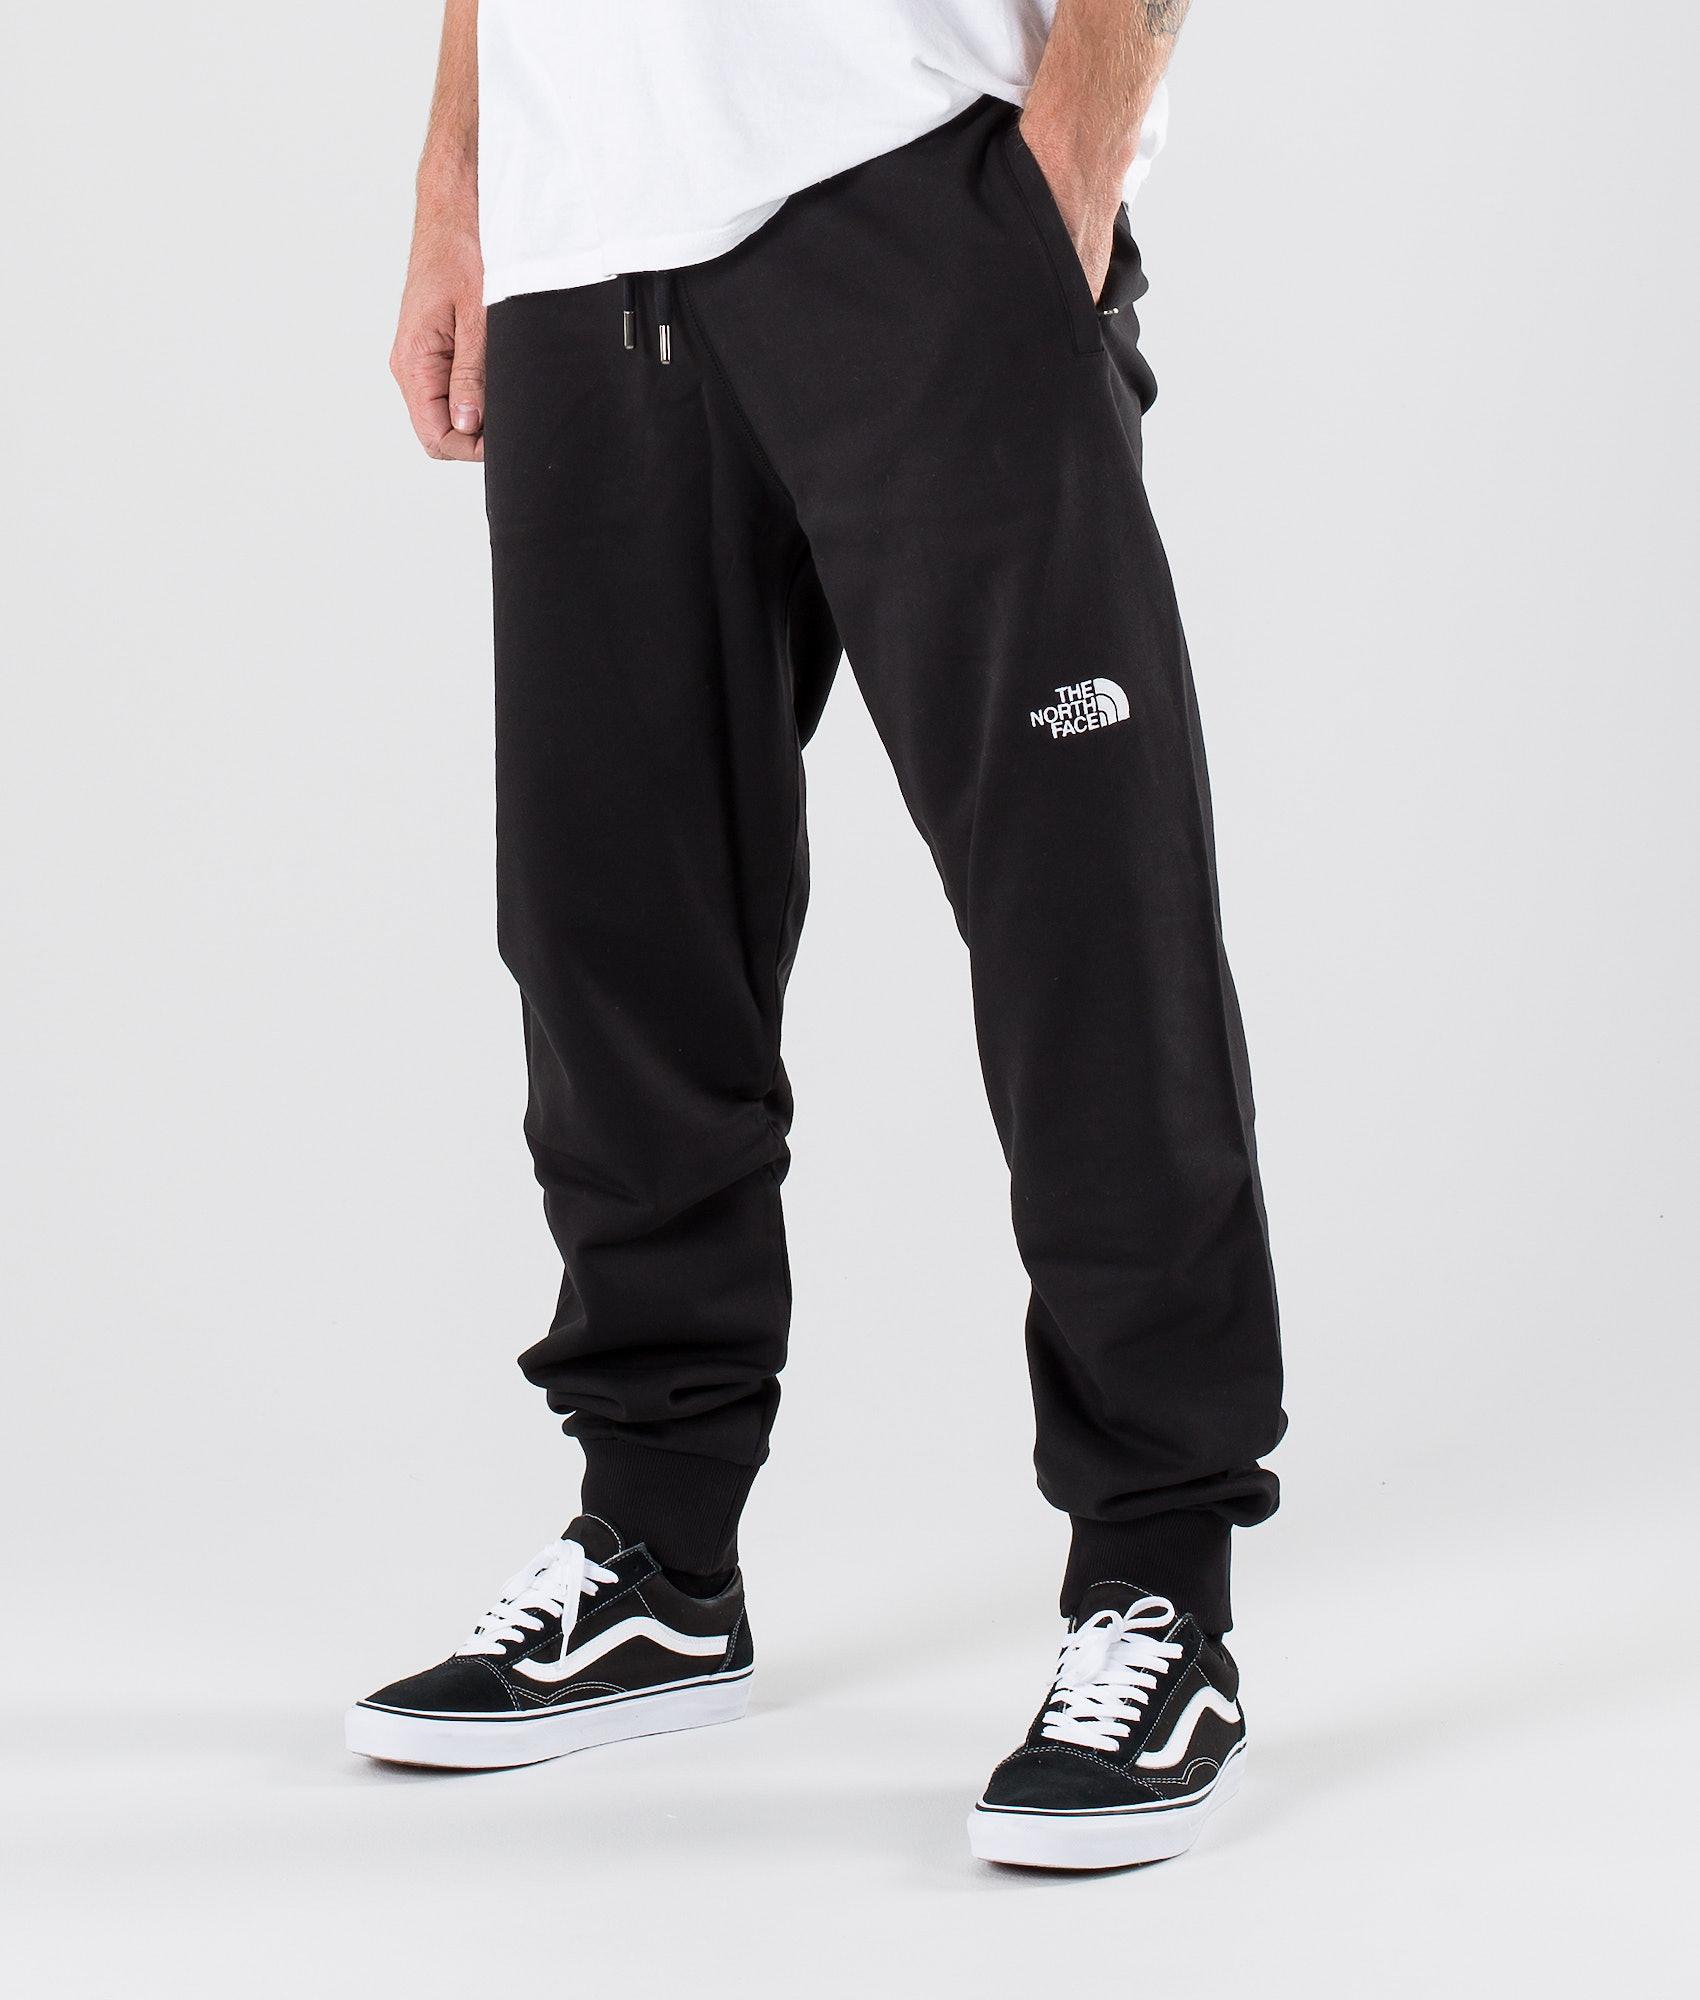 0cbffe2e Men's Walking Trousers & Hiking Pants   Free Delivery   RIDESTORE